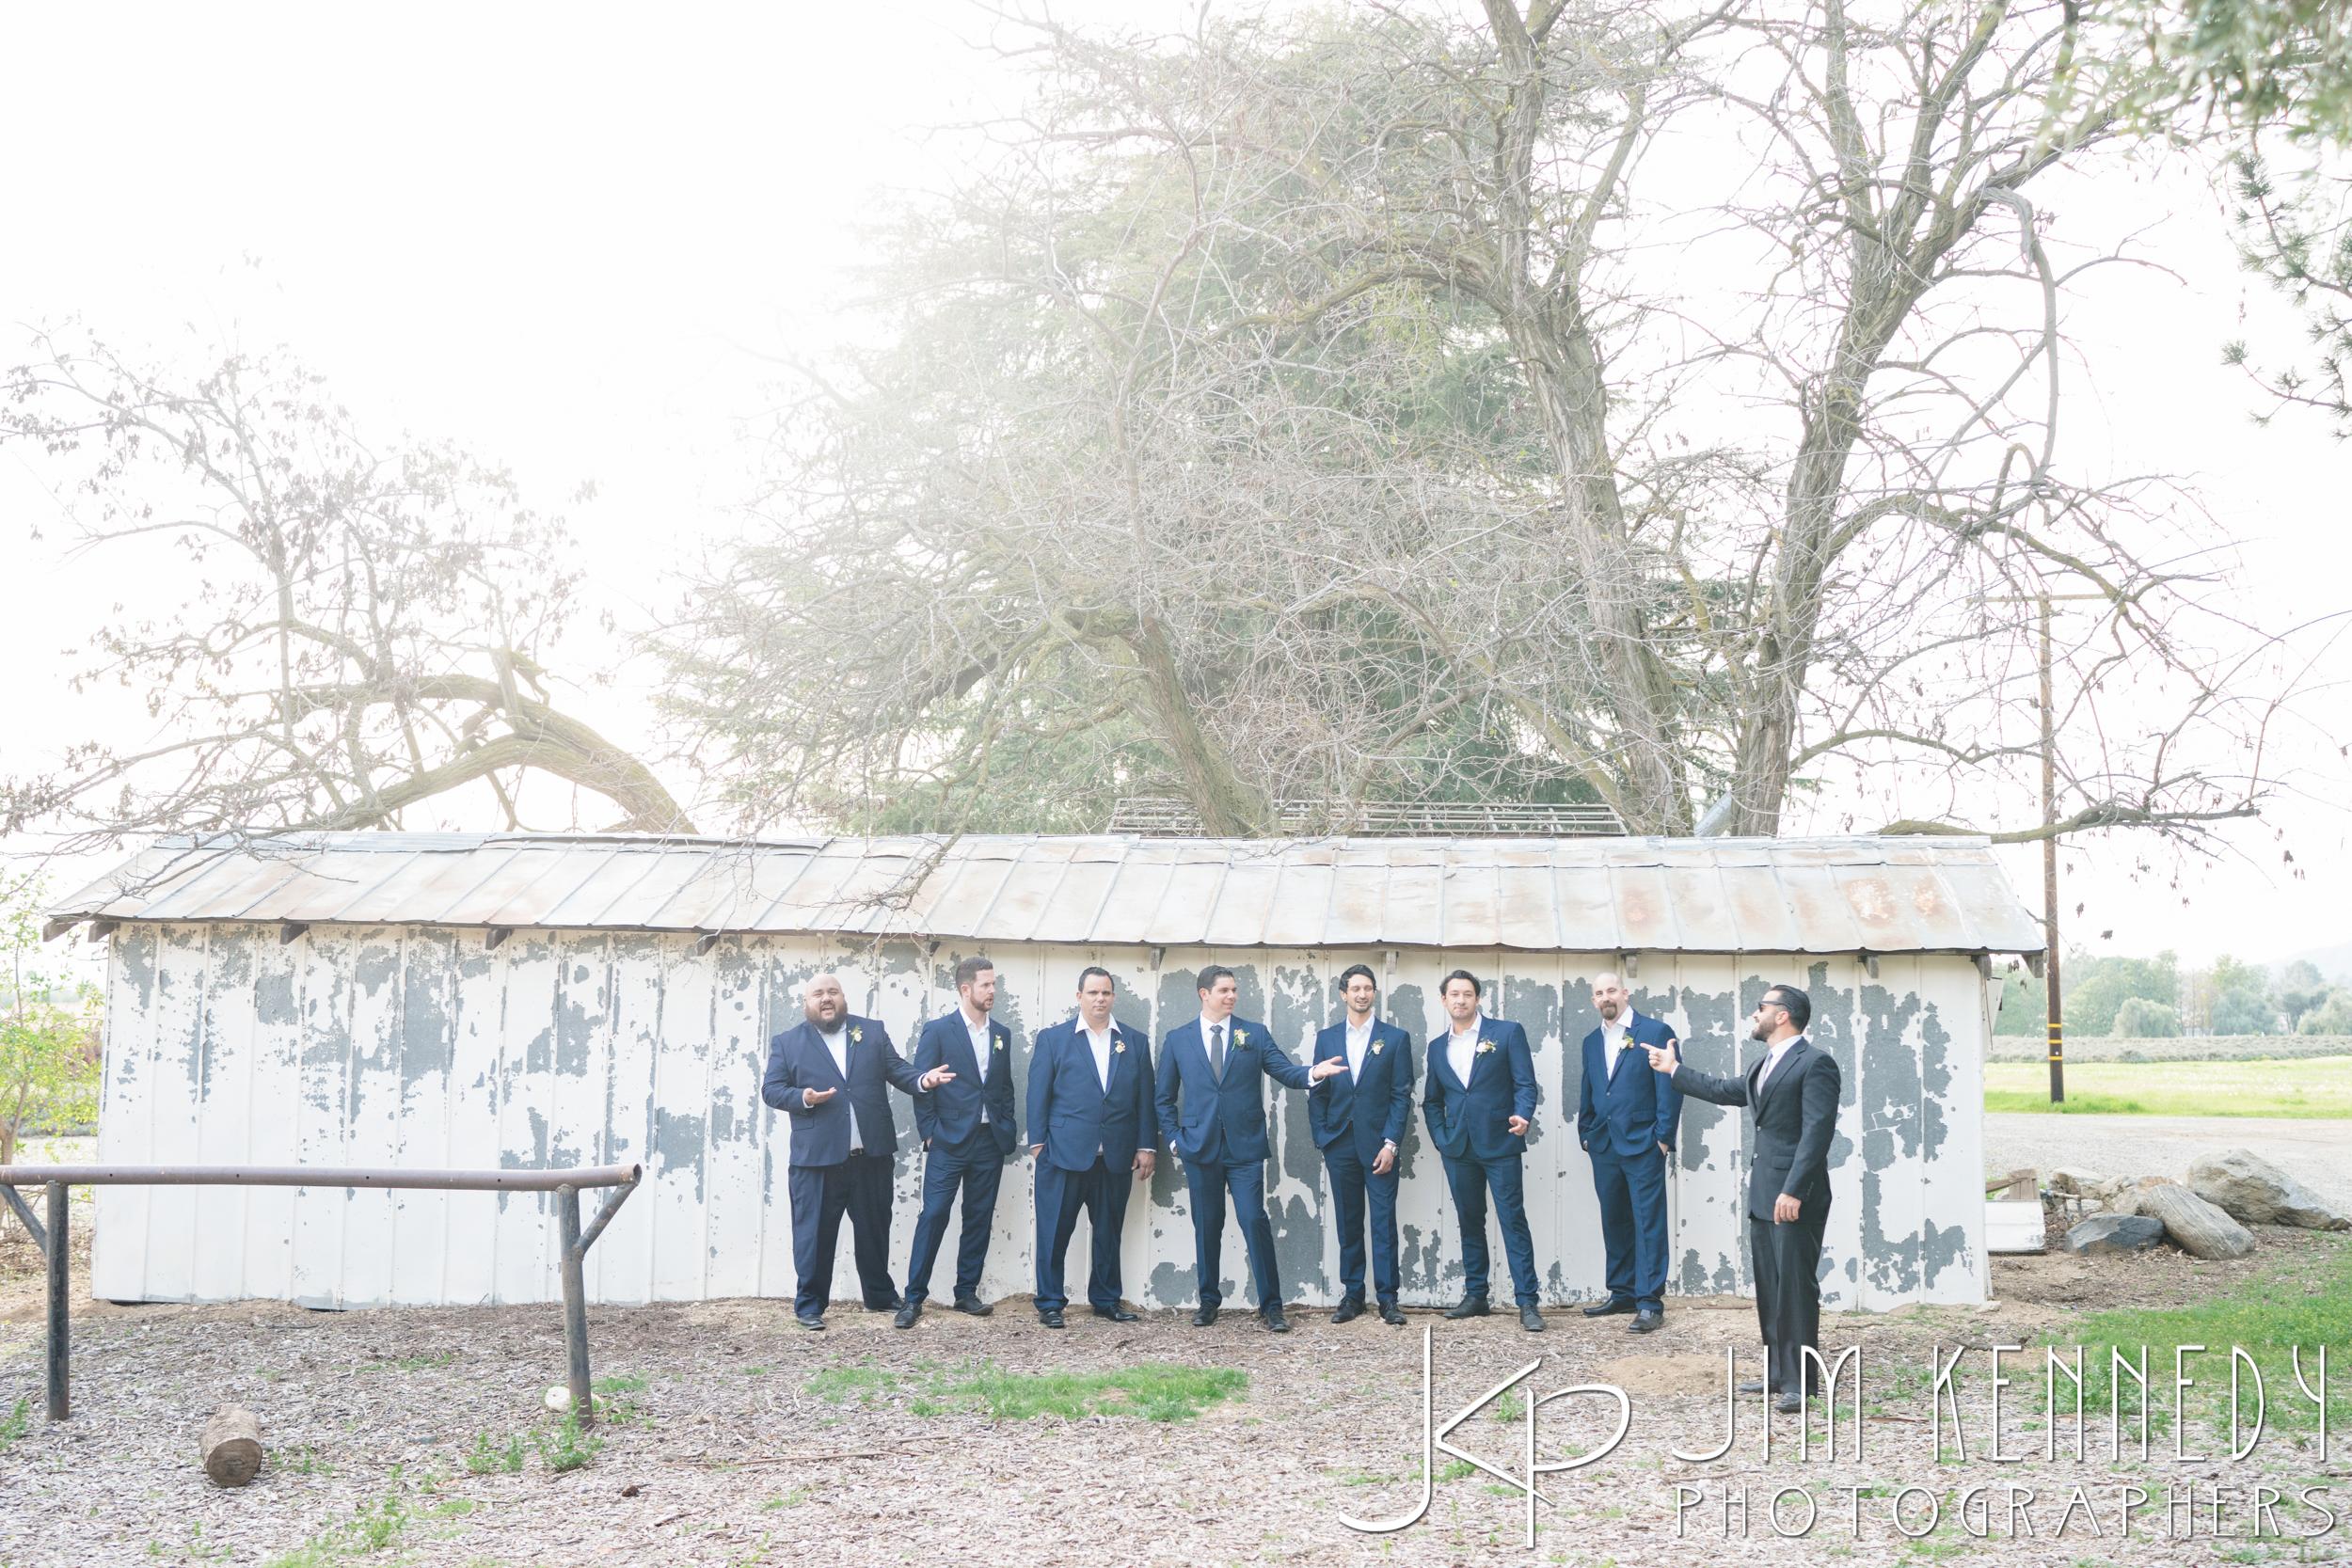 jim_kennedy_photographers_highland_springs_wedding_caitlyn_0094.jpg